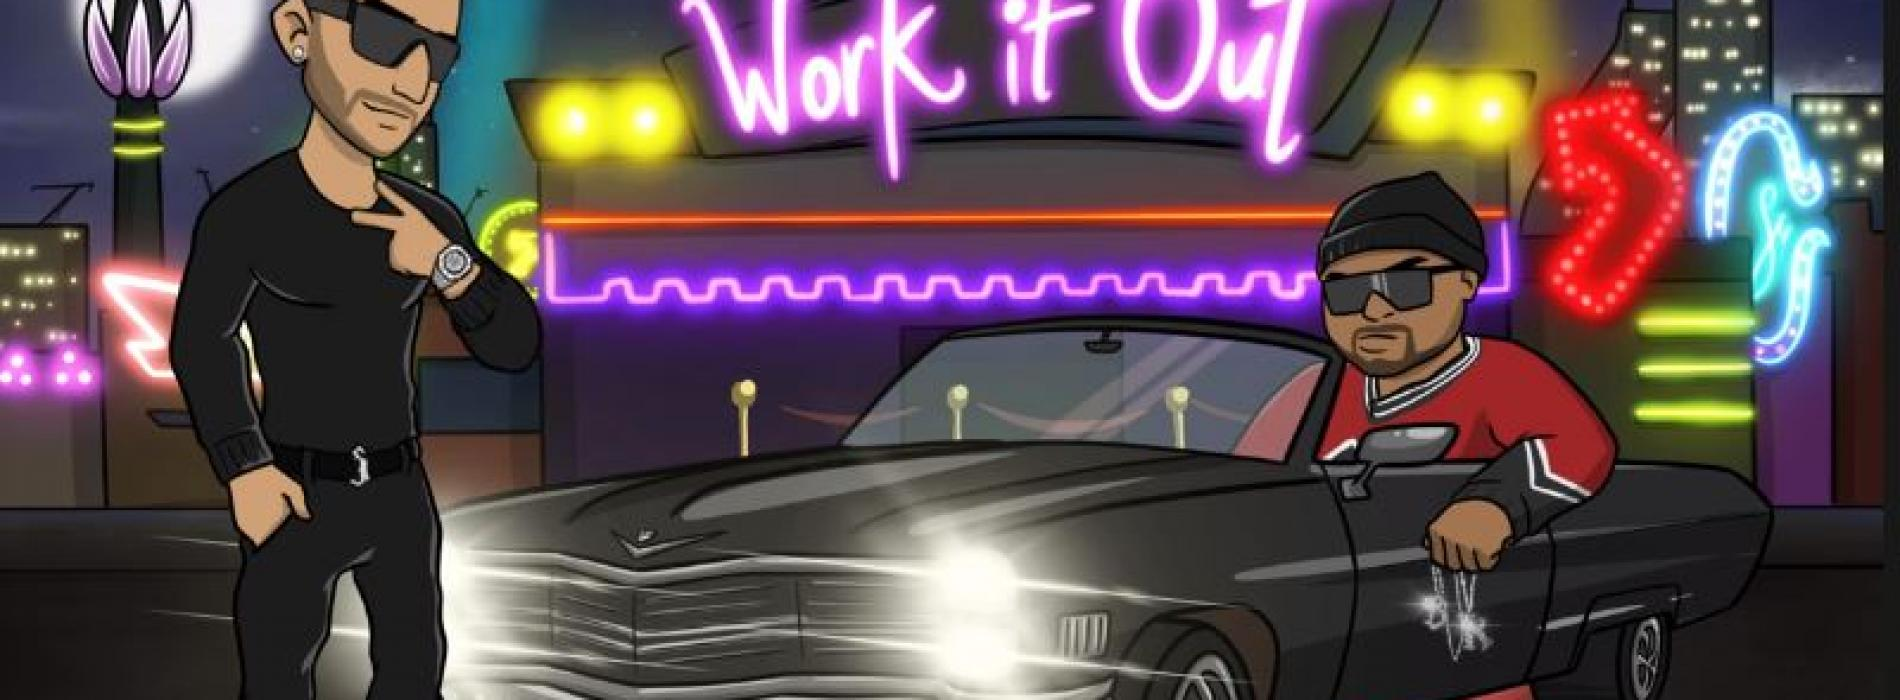 New Music : Spike – Work It Out feat Bone Killa (Audio)